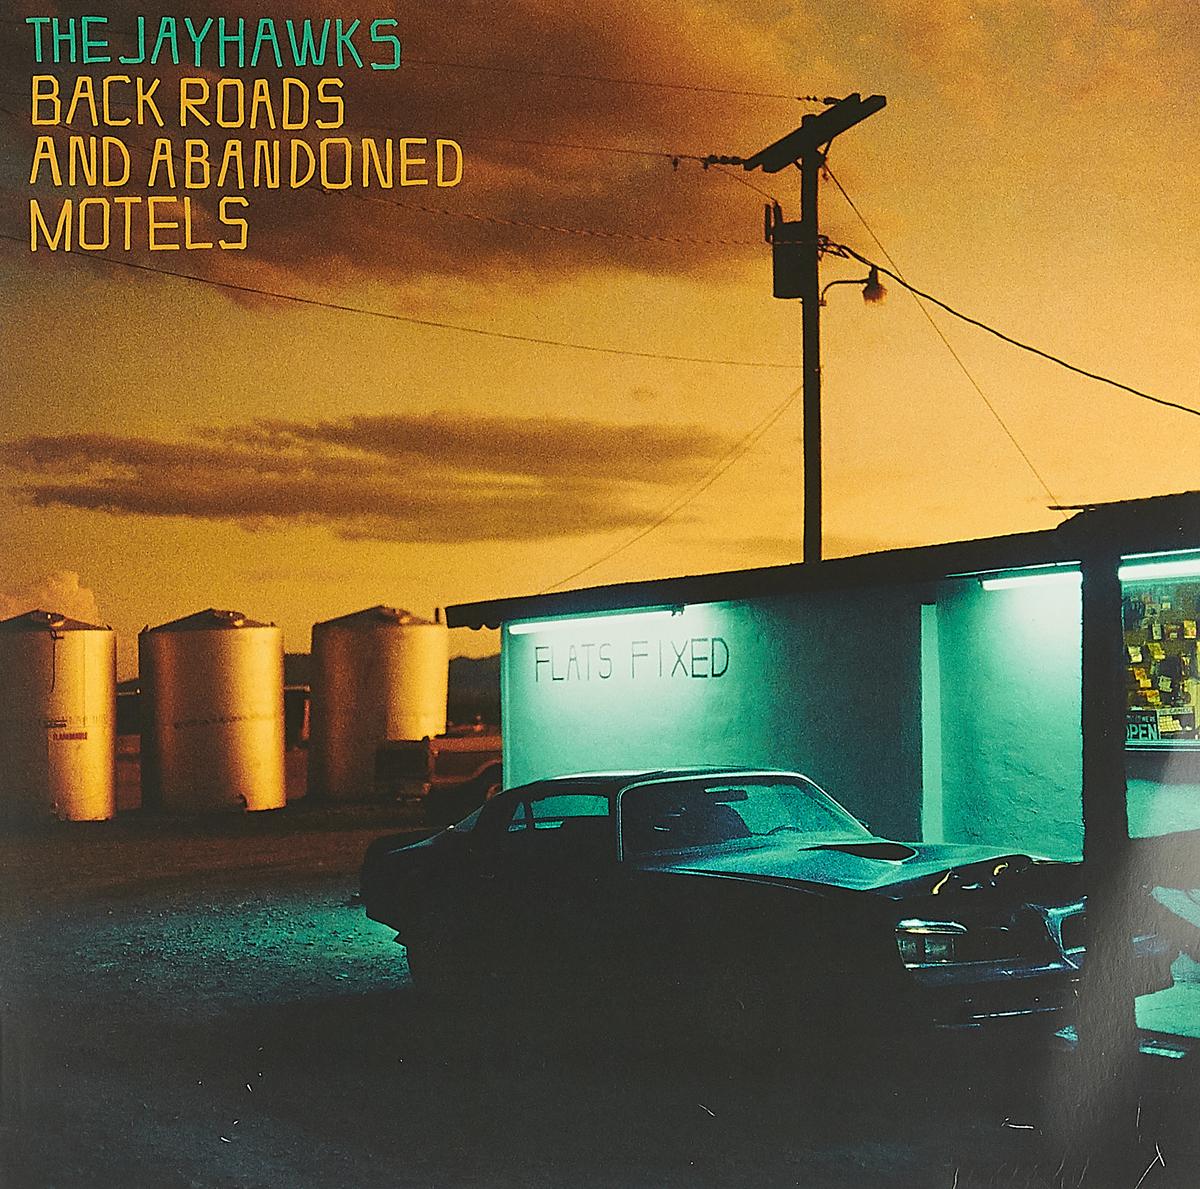 The Jayhawks The Jayhawks. Back Roads And Abandoned Motels (LP) back roads spain